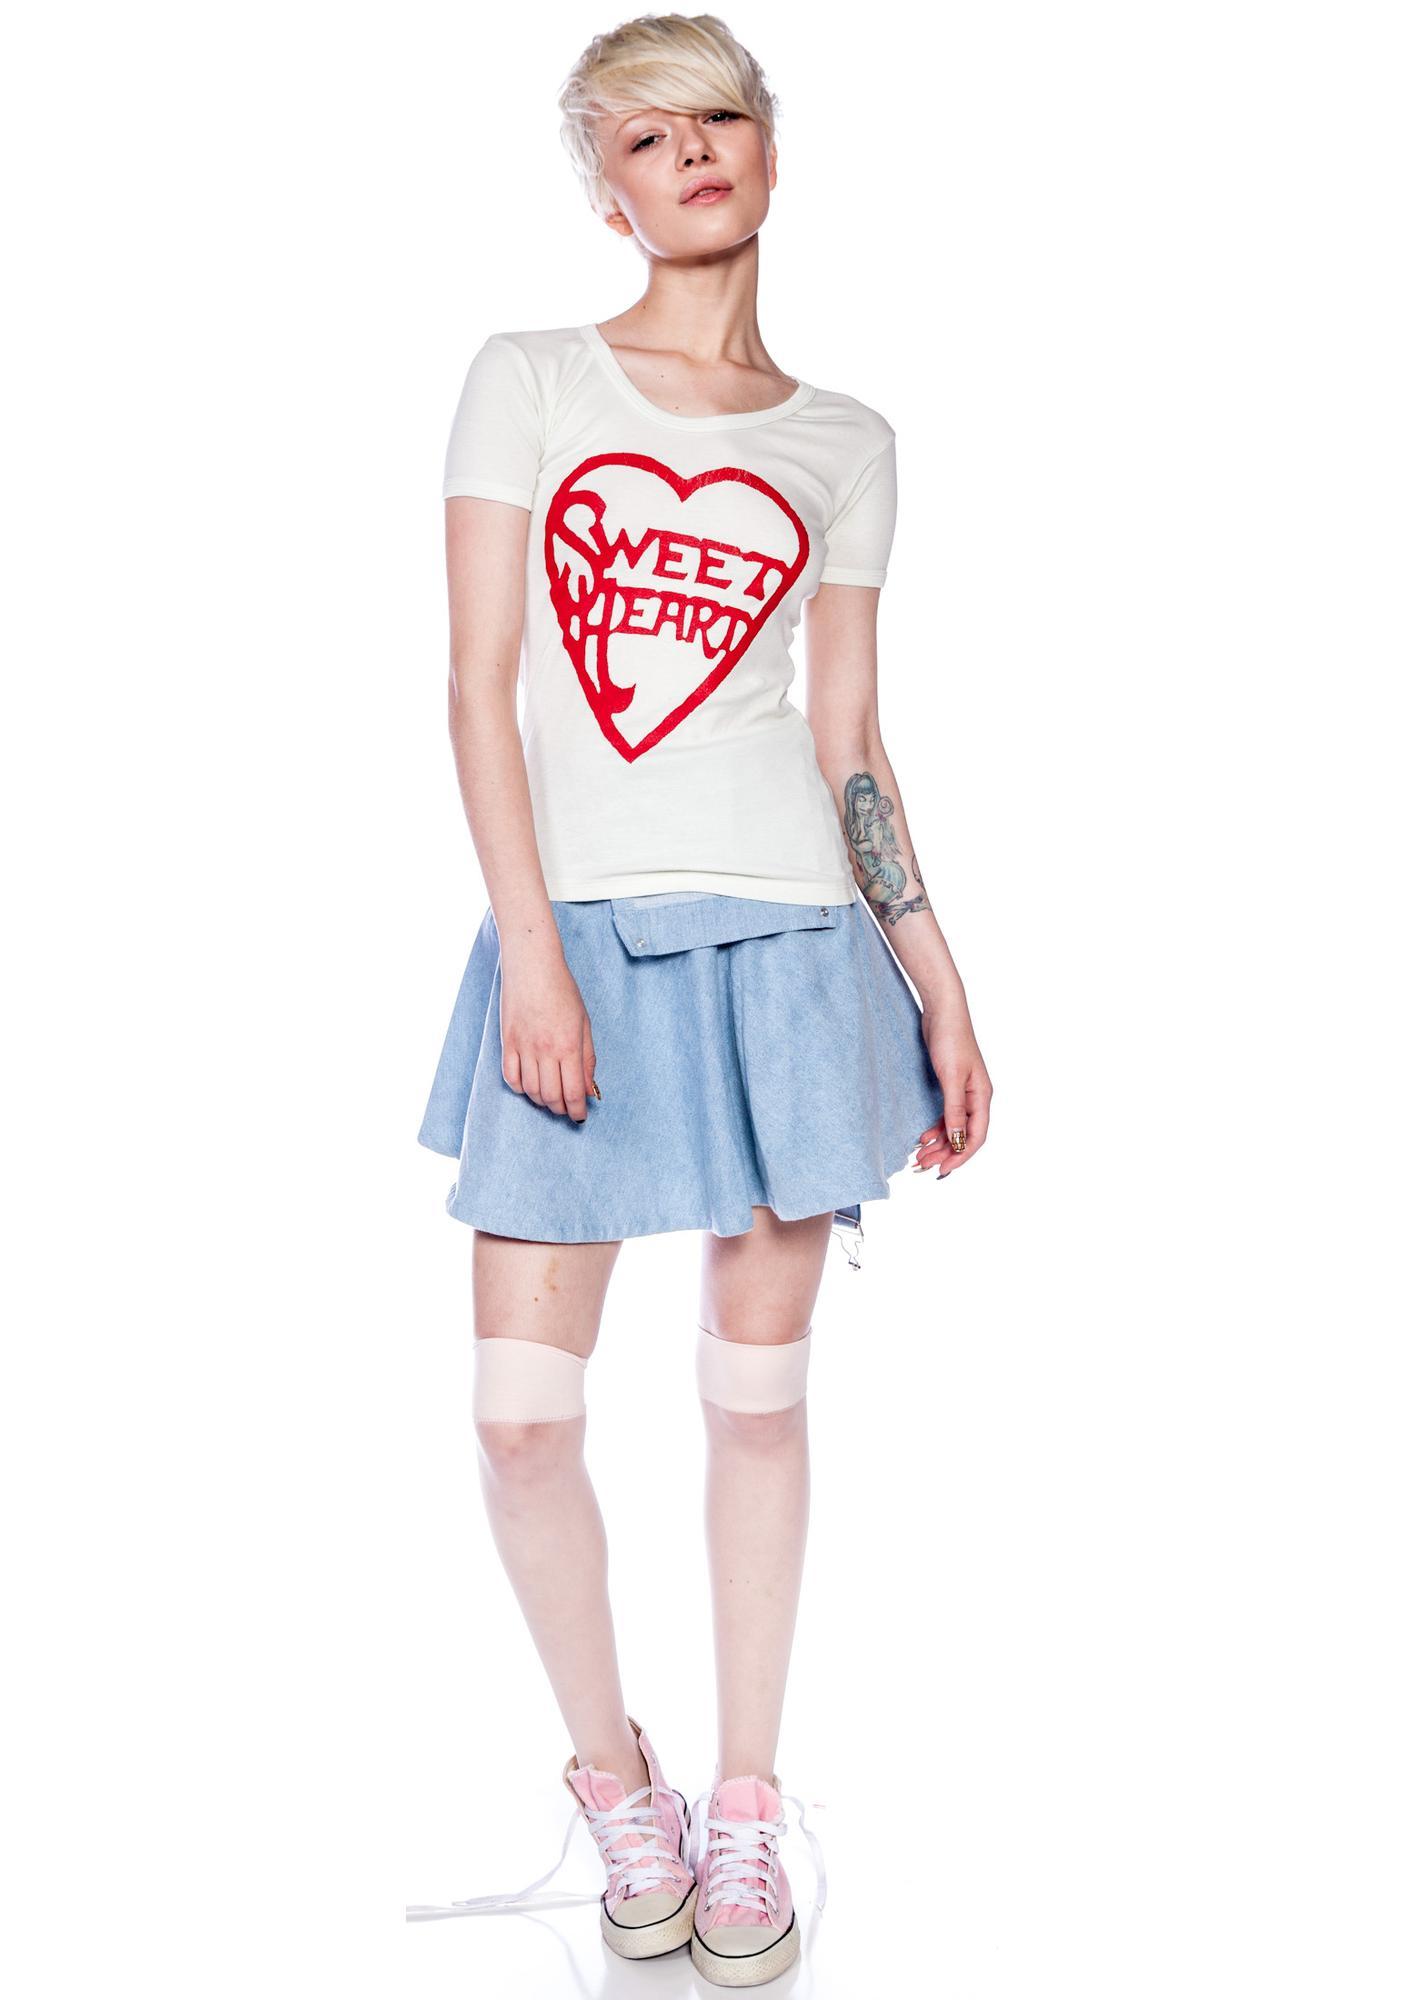 Bandit Brand Sweet Heart 70's Tee